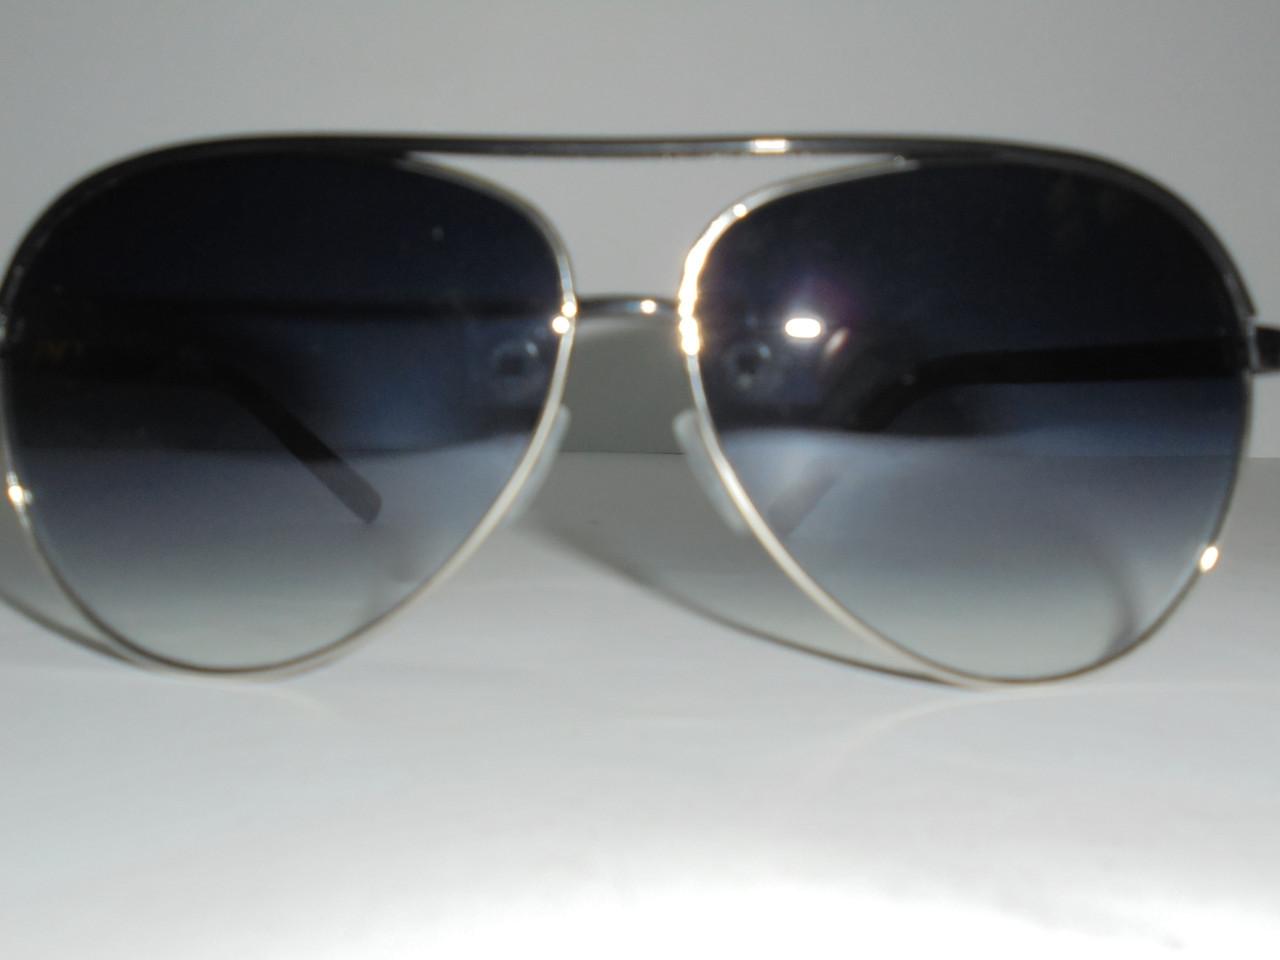 Солнцезащитные очки Aviator Ray-Ban 6600 bcdd5c7b3b13c